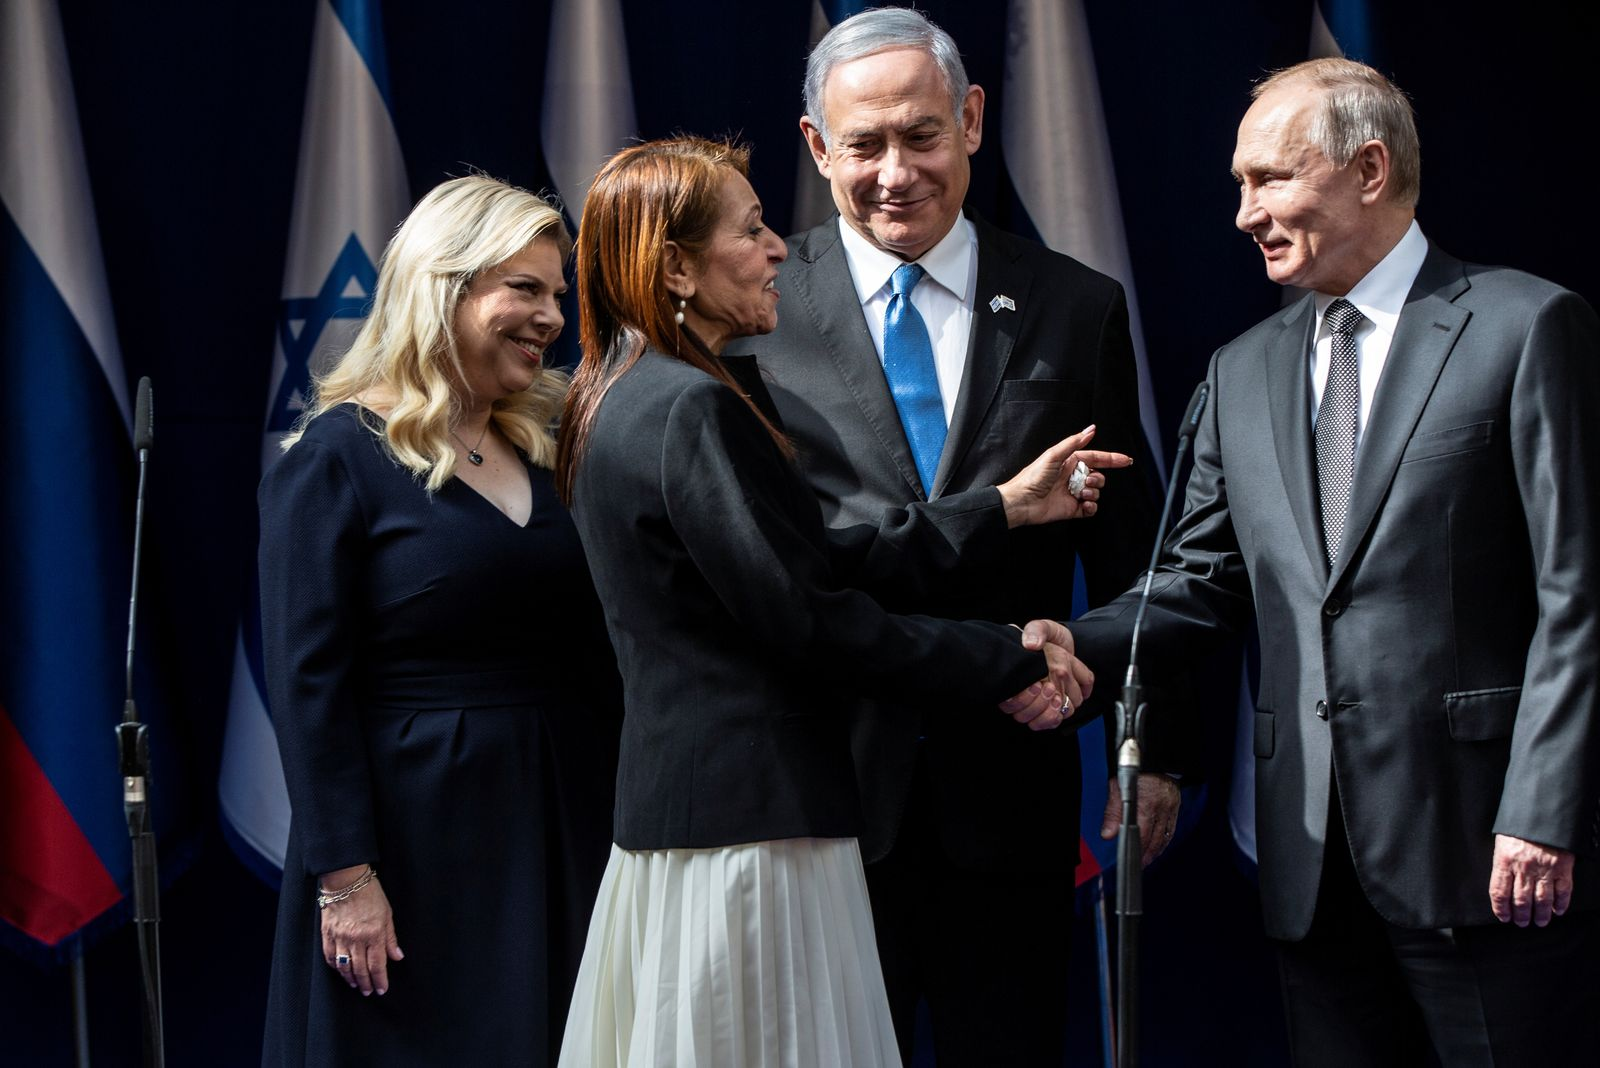 Israeli PM Netanyahu receives Russian President Putin ahead of the World Holocaust Forum at the Yad Vashem memorial centre in Jerusalem